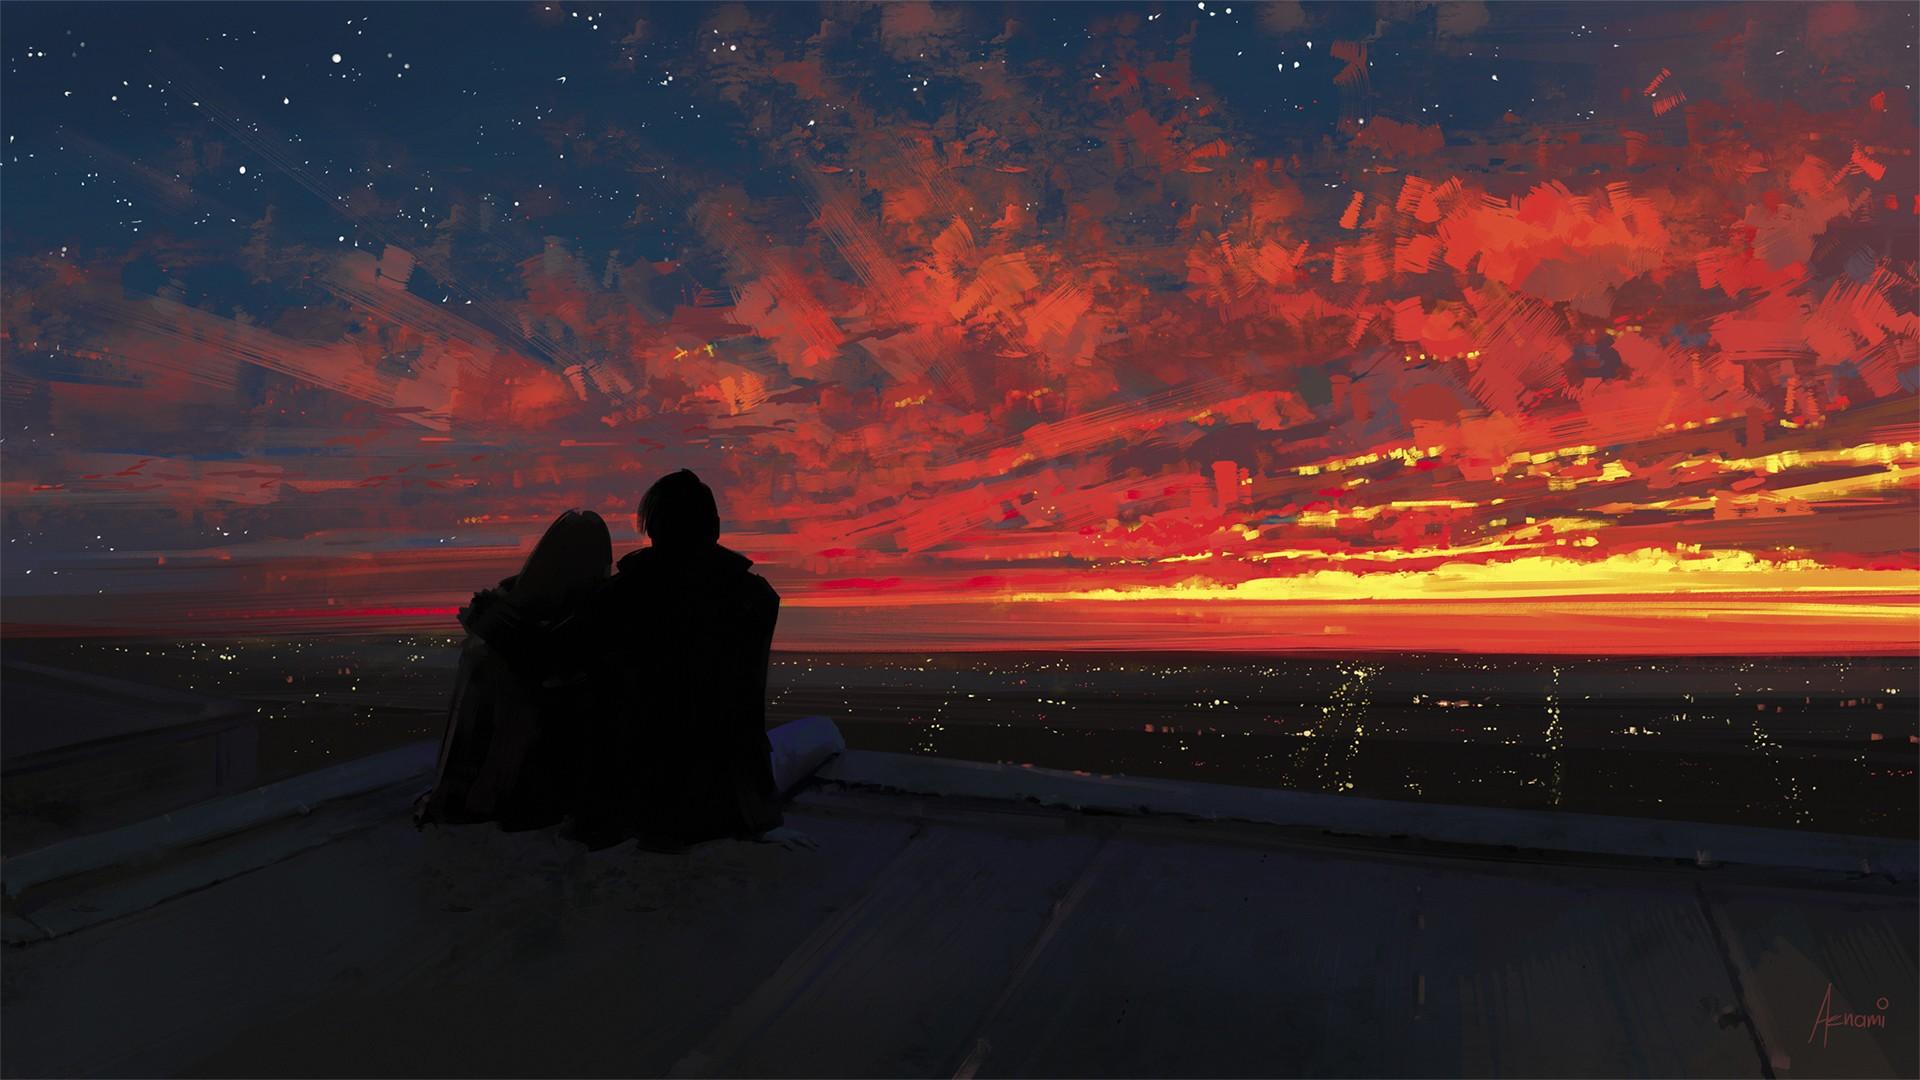 wallpaper   fantasy art  sunset  night  sky  sunrise  evening  horizon  couple  dusk  light